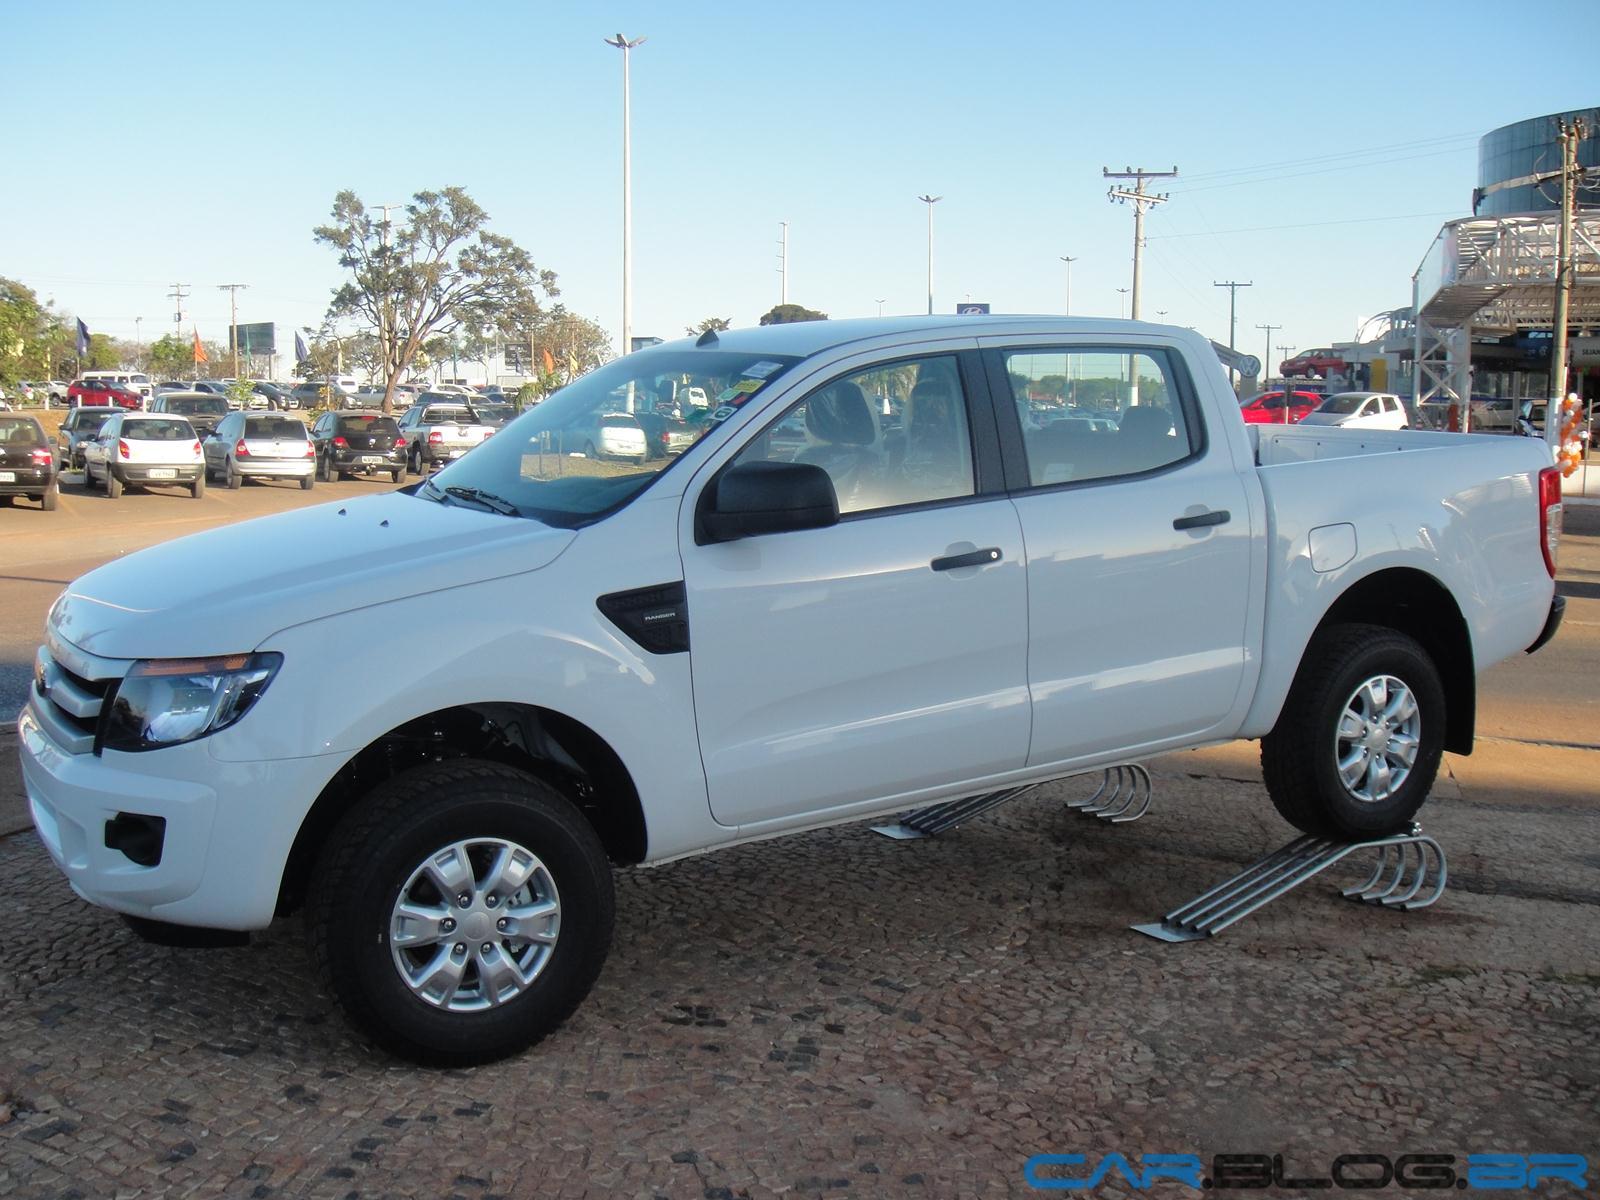 Nova ford ranger xls cabine dupla 2 5 flex 2013 branca